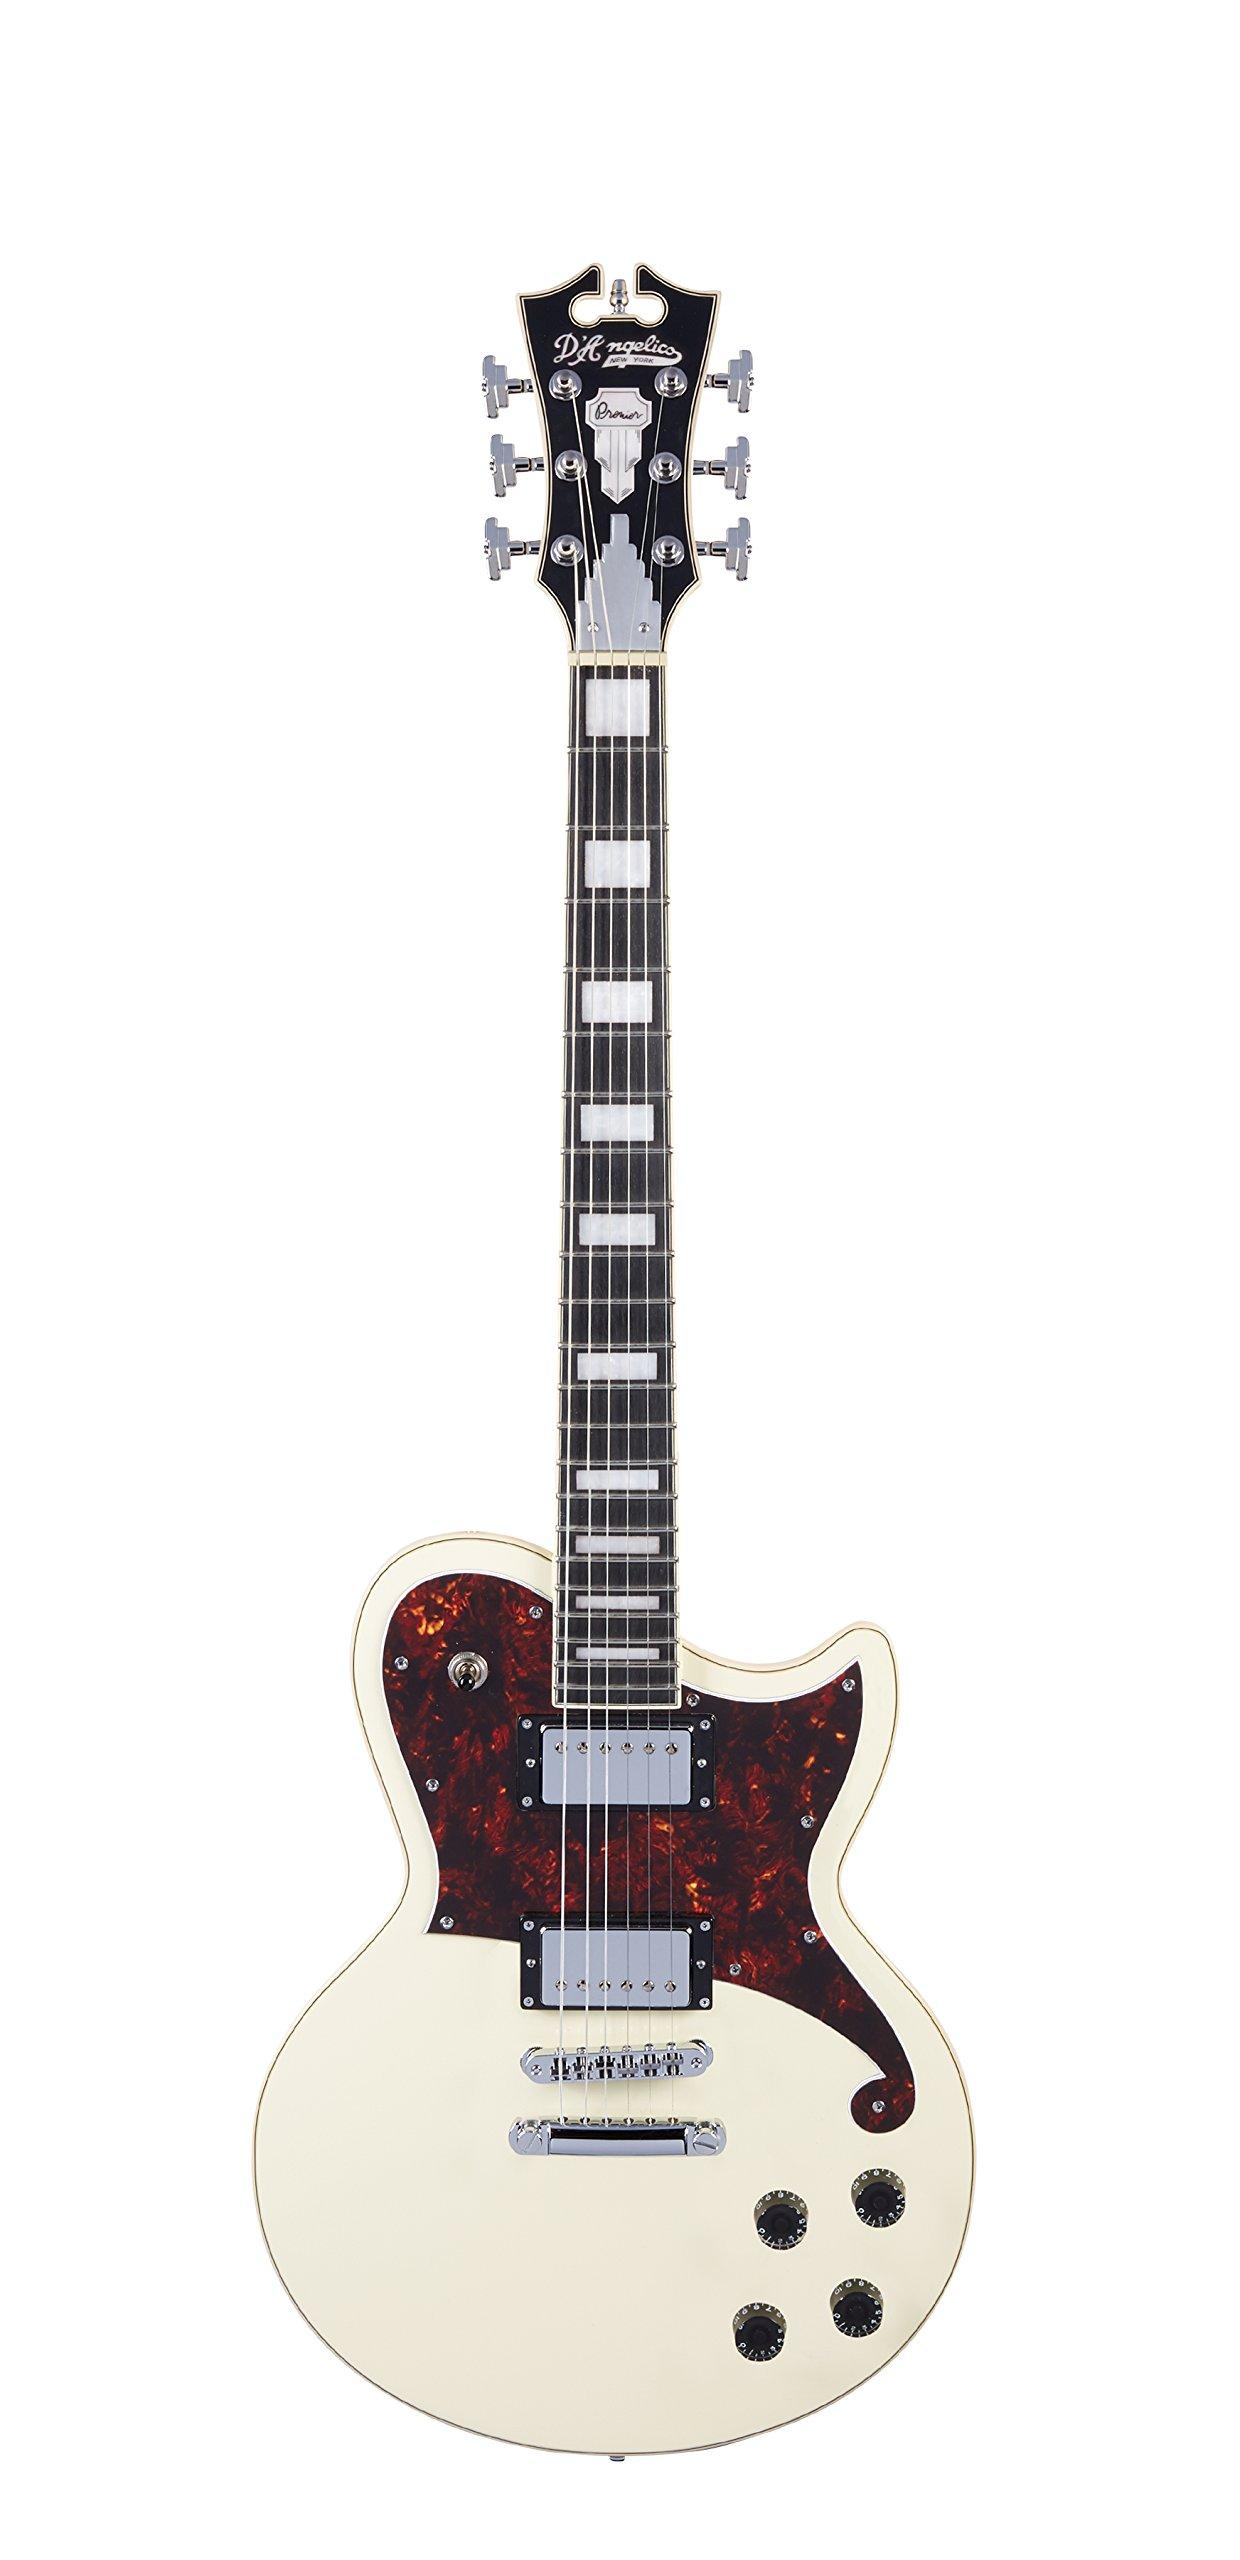 Cheap D Angelico Premier Atlantic Electric Guitar - Antique White Black Friday & Cyber Monday 2019